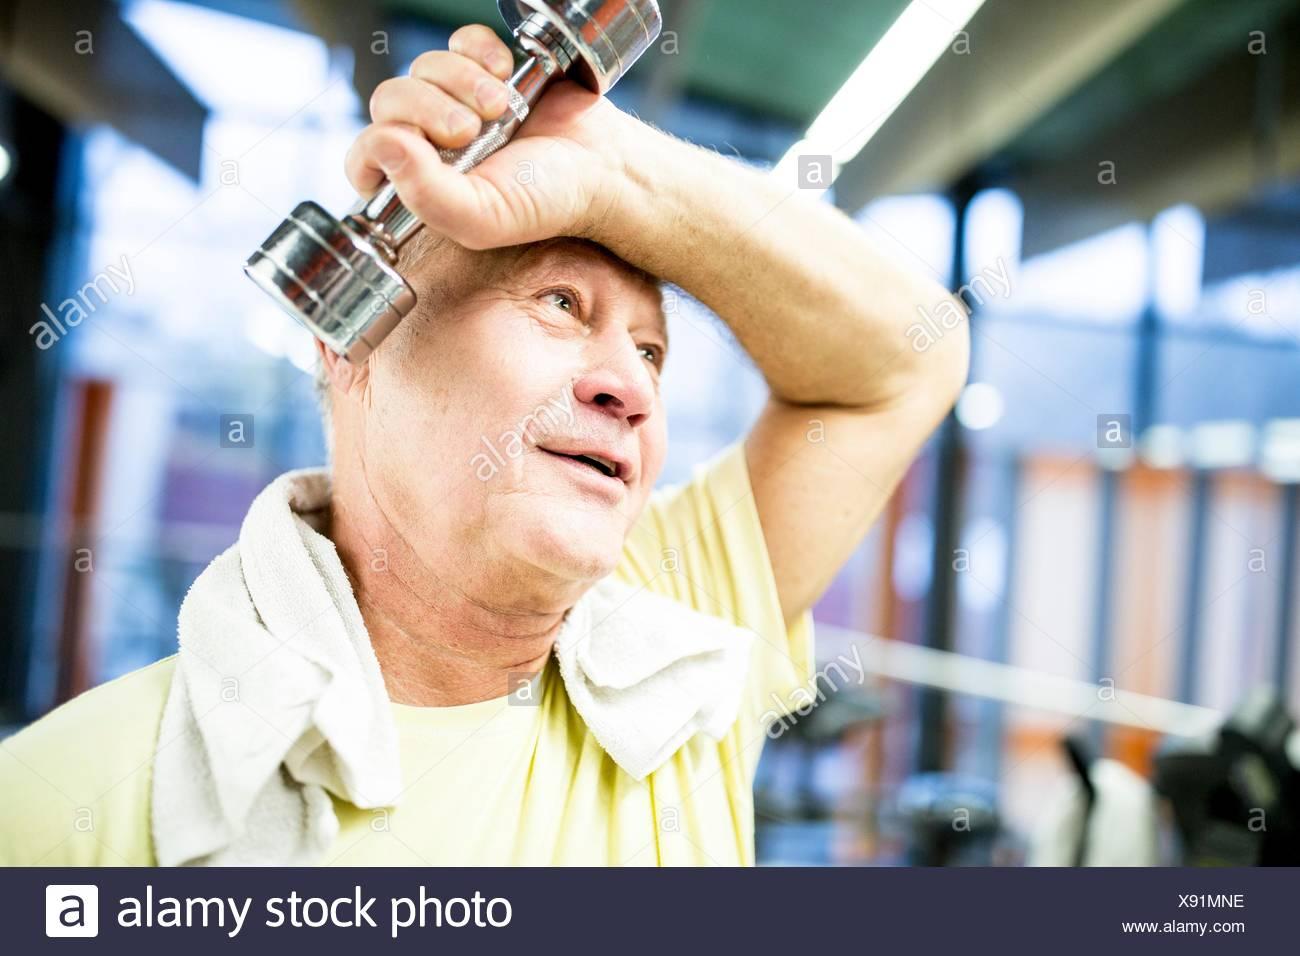 PROPERTY RELEASED. MODEL RELEASED. Senior man holding dumbbell in gym. - Stock Image